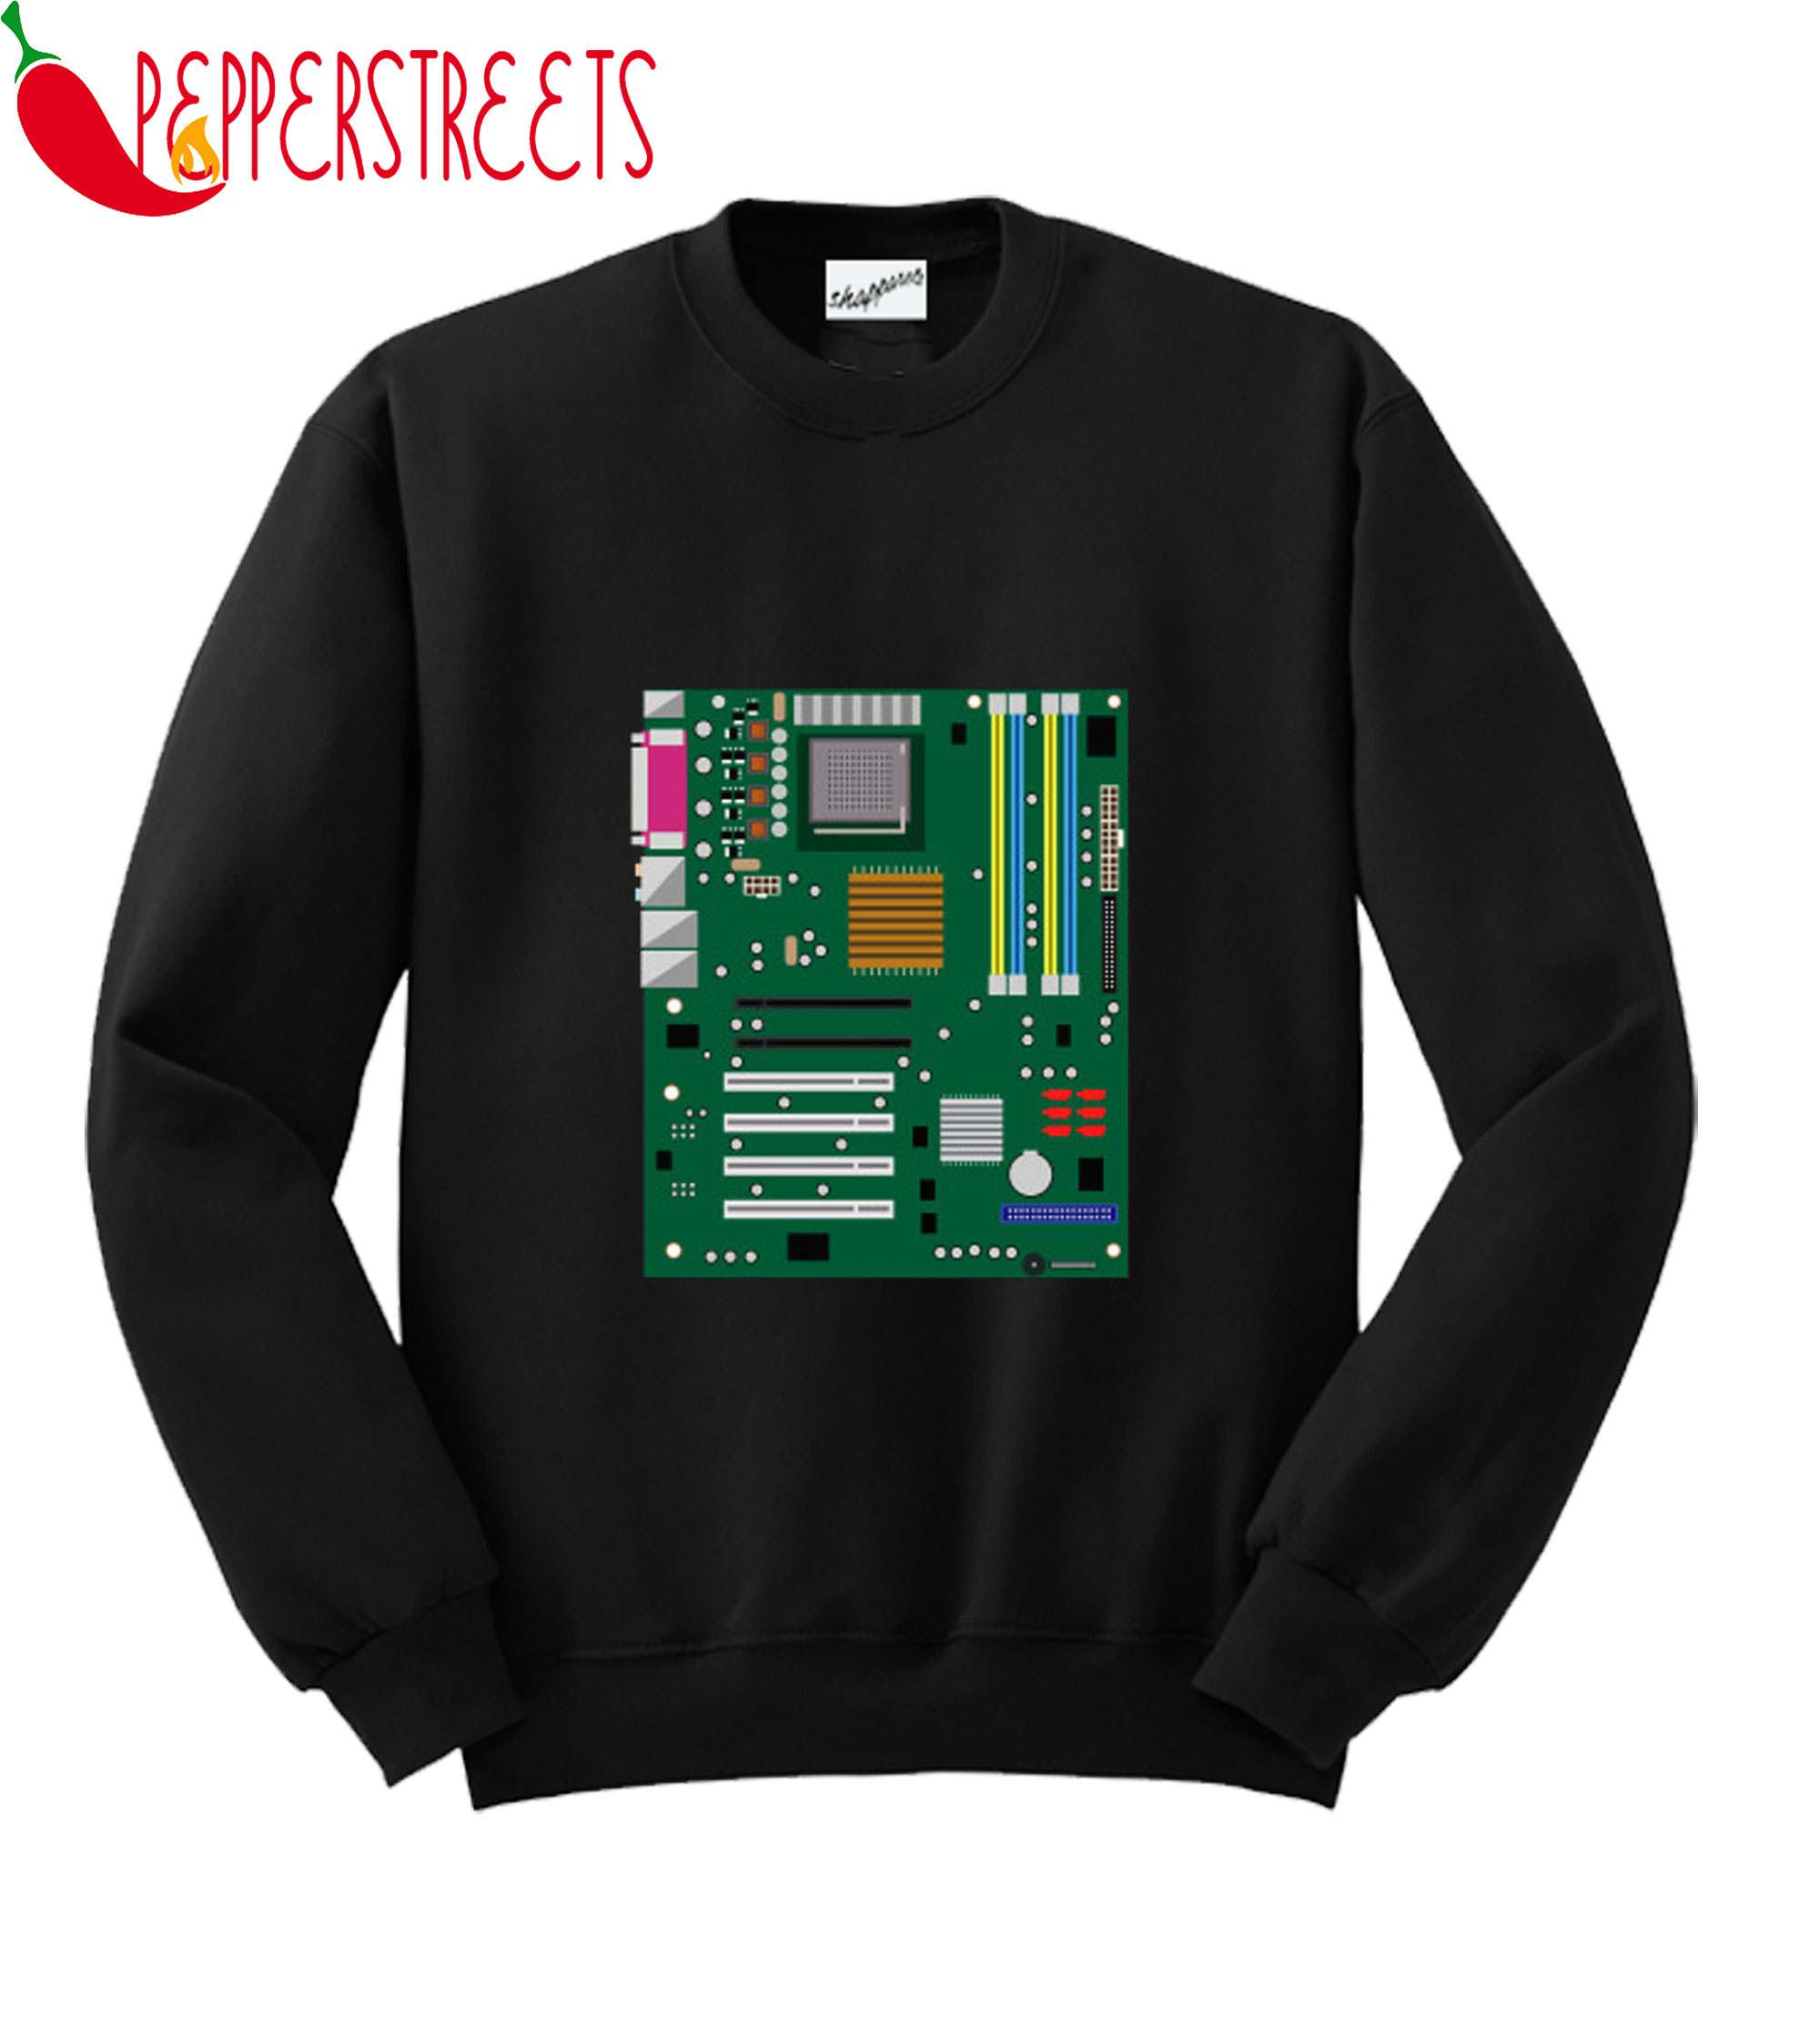 Computer Engineering Motherboard Hardware Sweatshirt